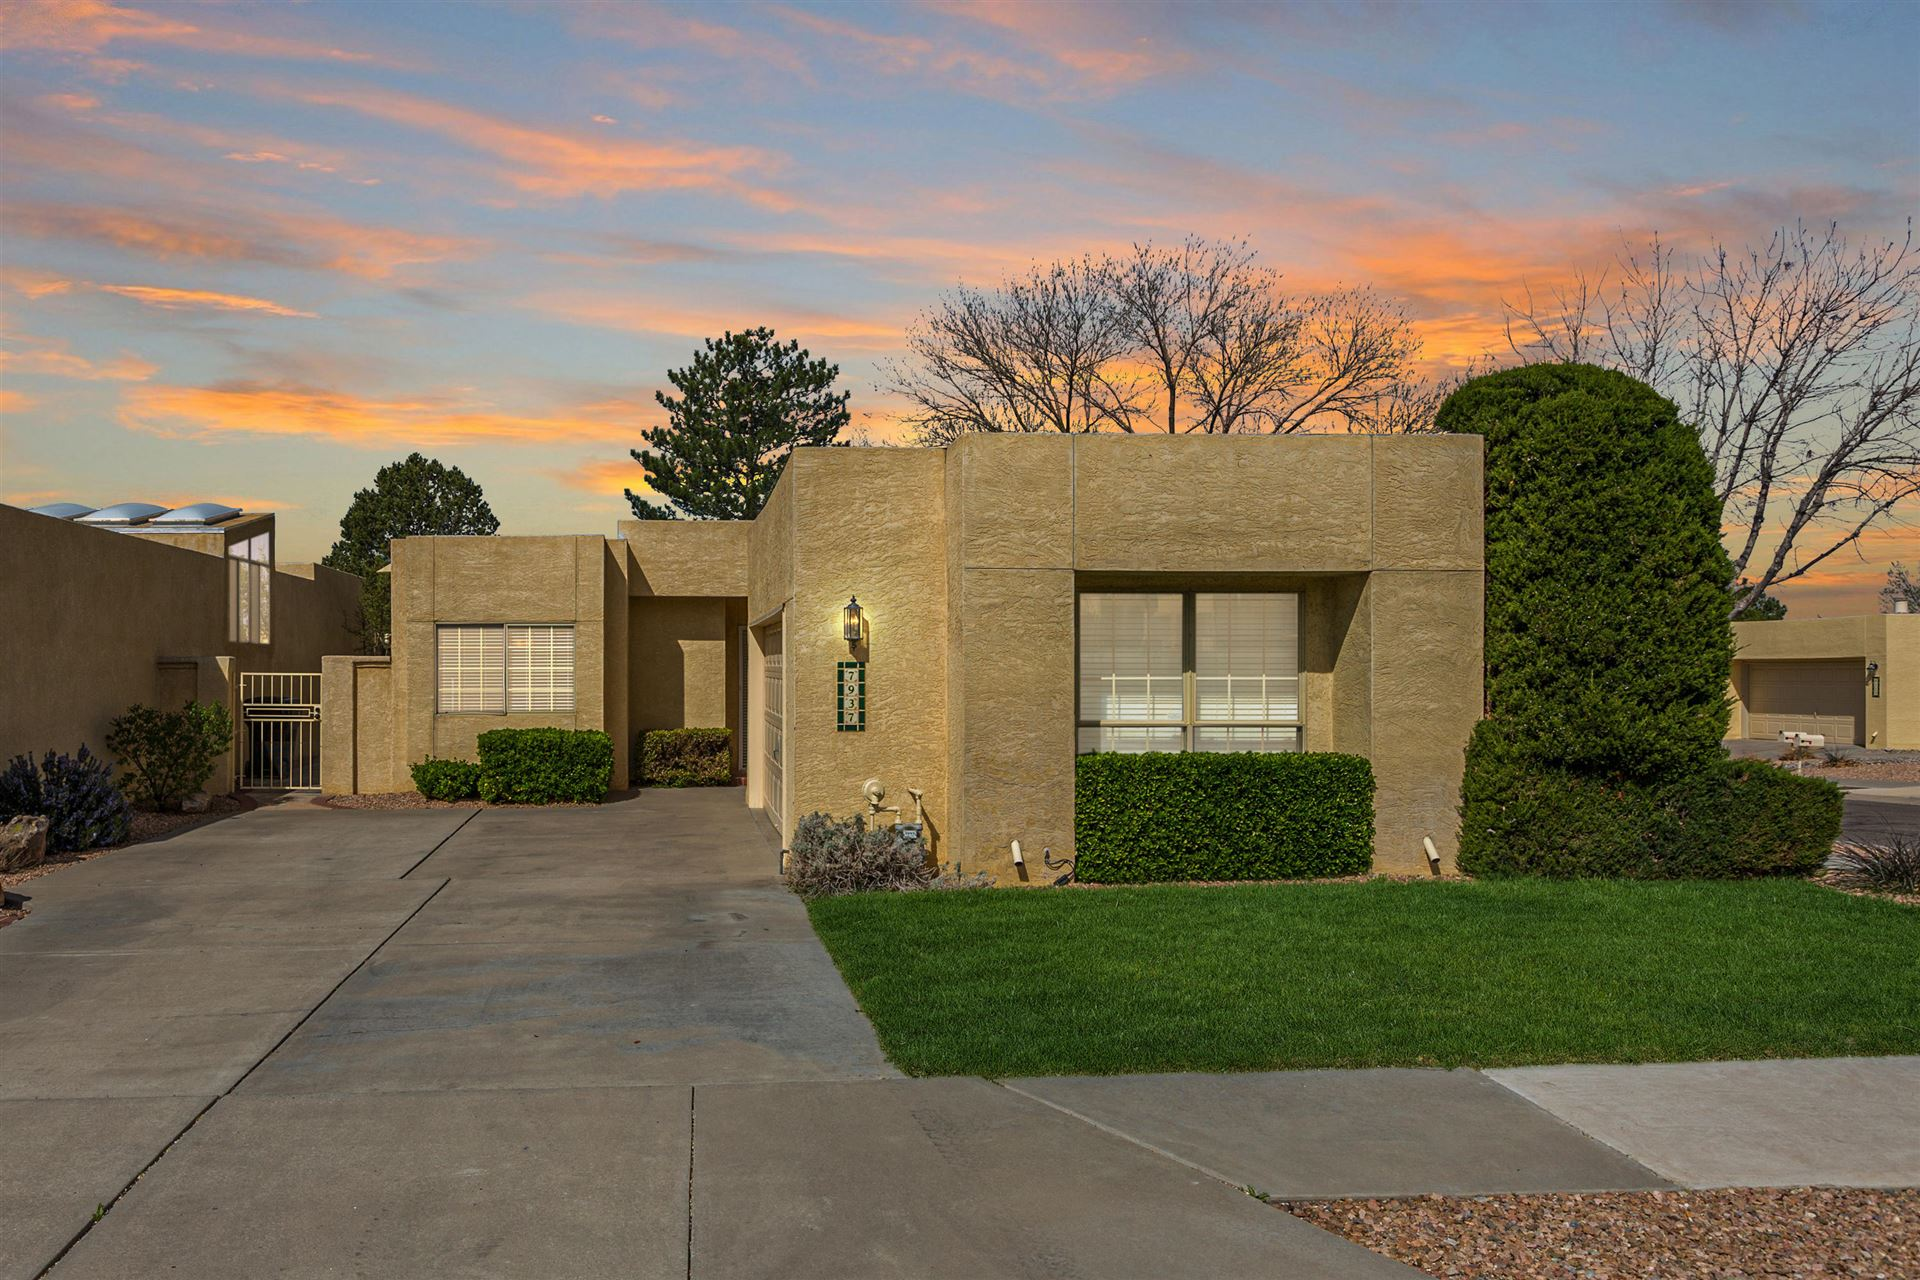 7937 WOODWIND Drive NE, Albuquerque, NM 87109 - MLS#: 989262